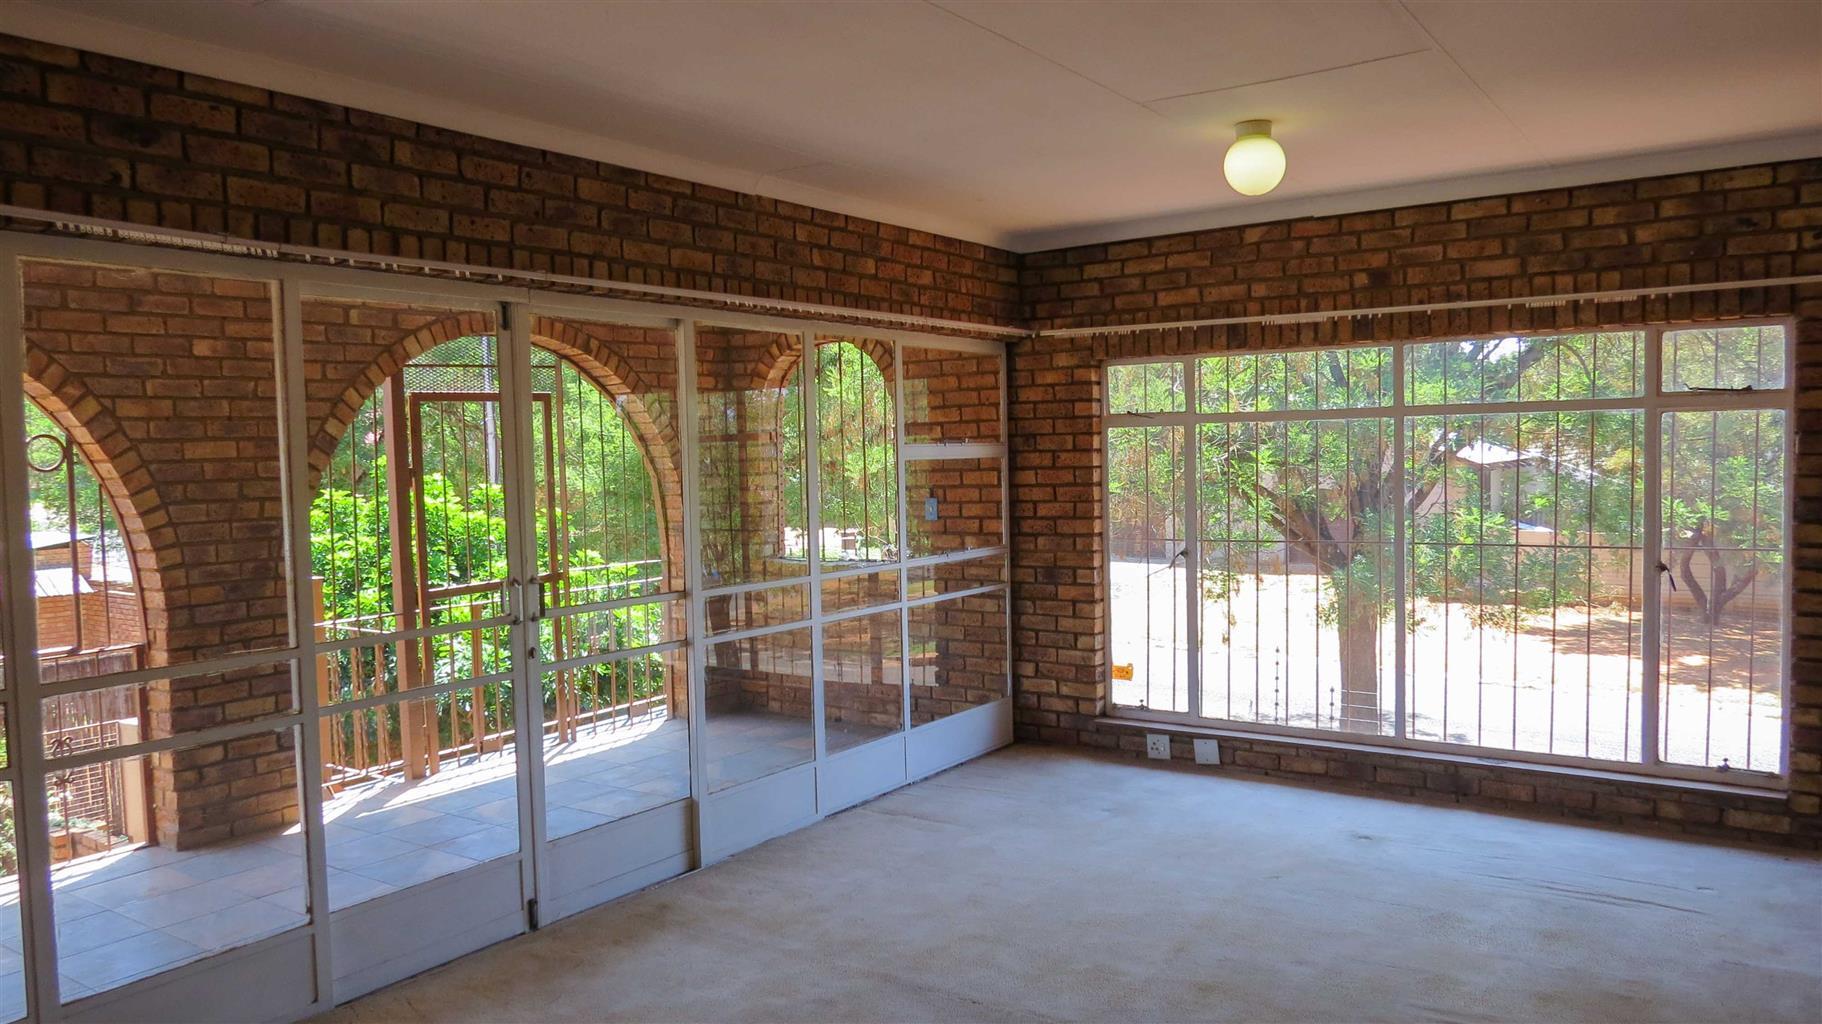 Huge 7 Bedroom INVESTMENT House for sale, Waverley